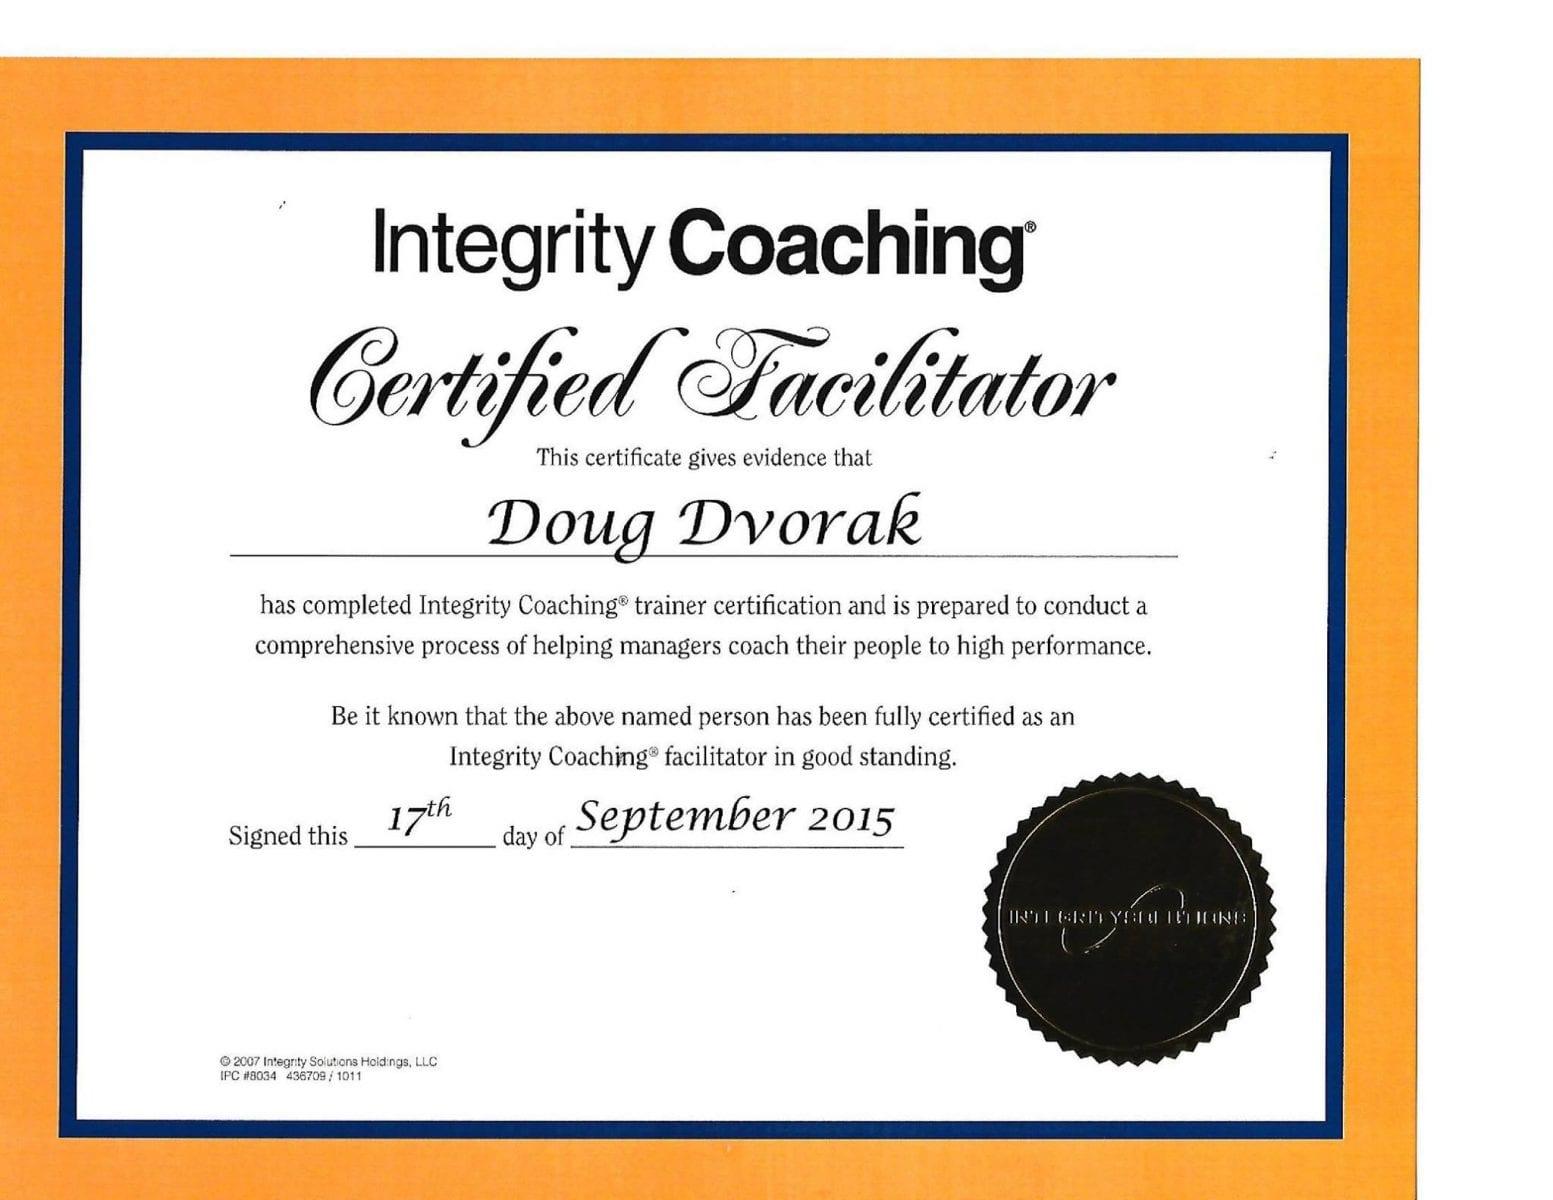 Doug Dvorak now joins the